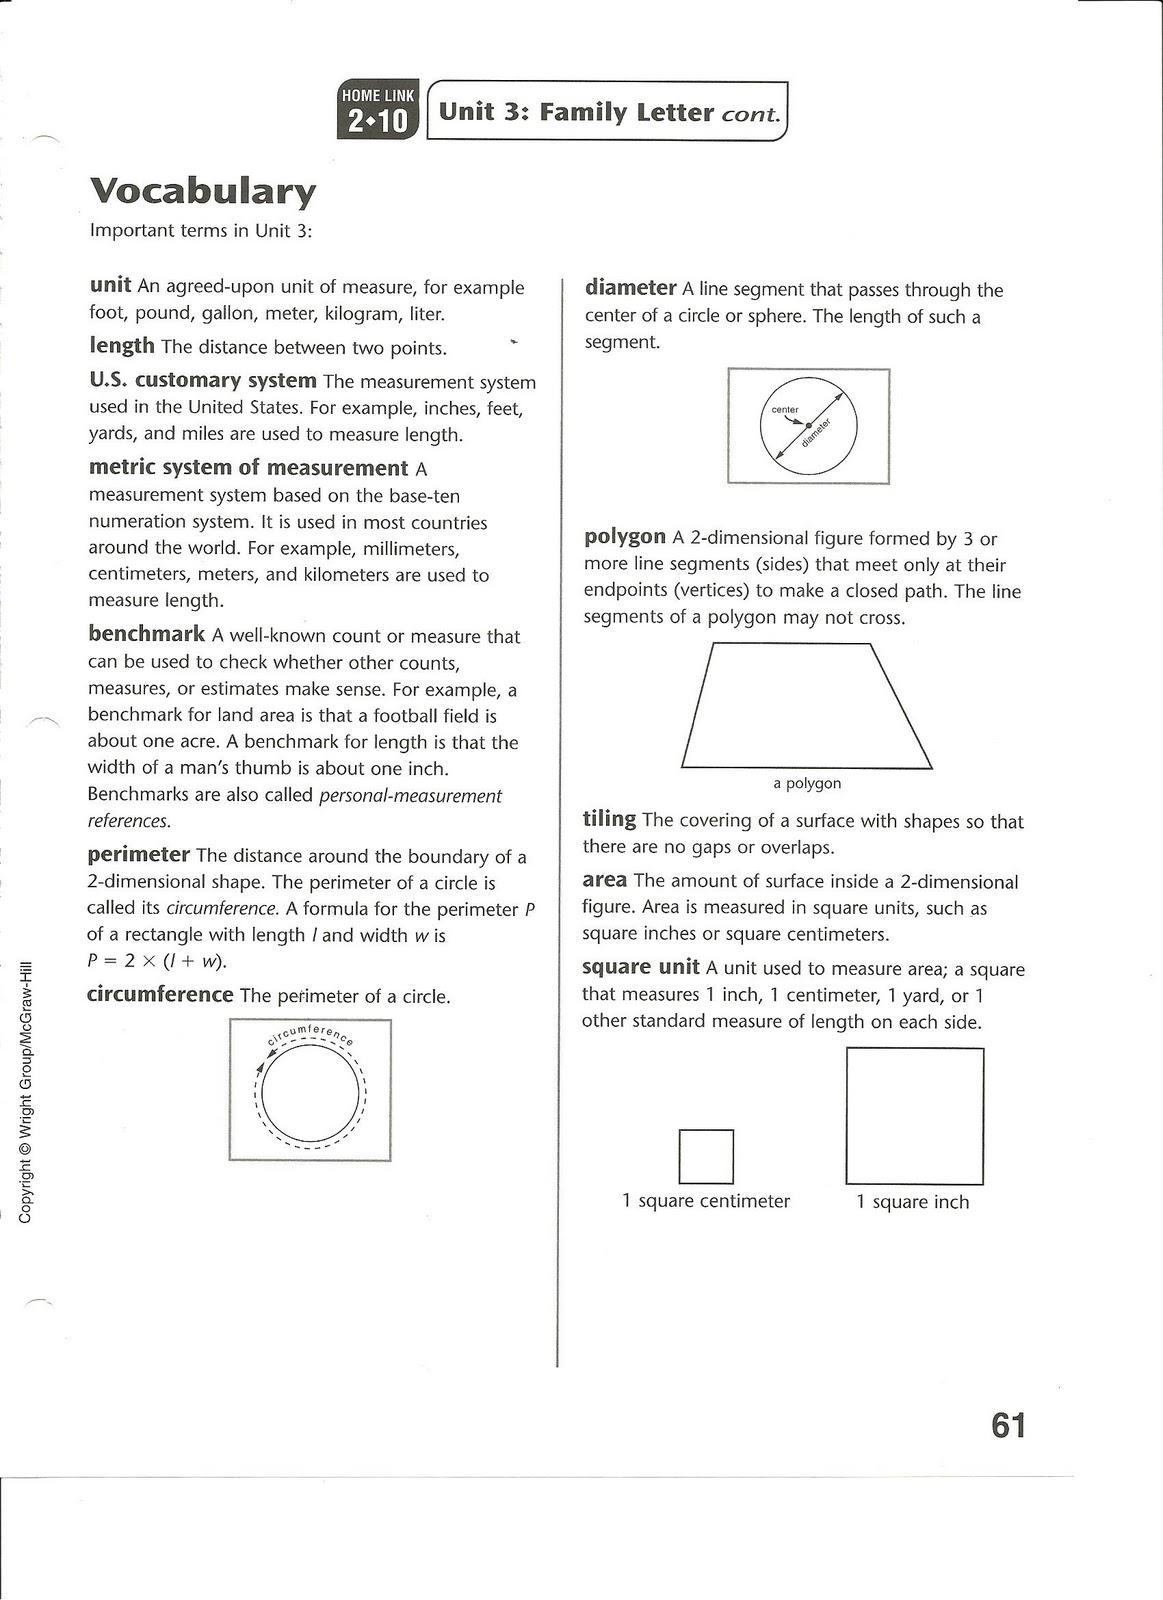 About the Google Ads Fundamentals assessment - Google Ads Help